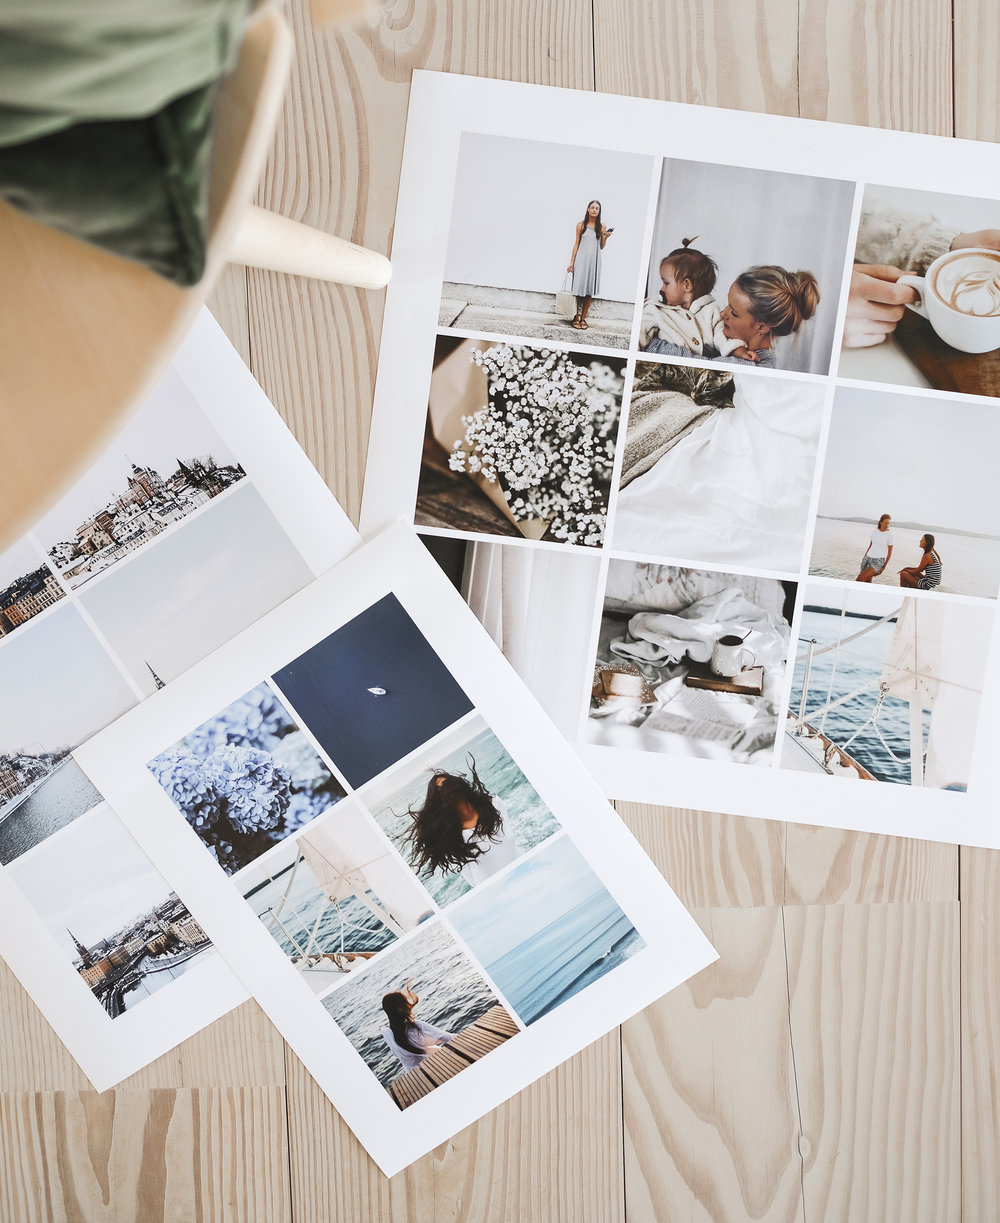 Fotoposters i olika grids och storlek